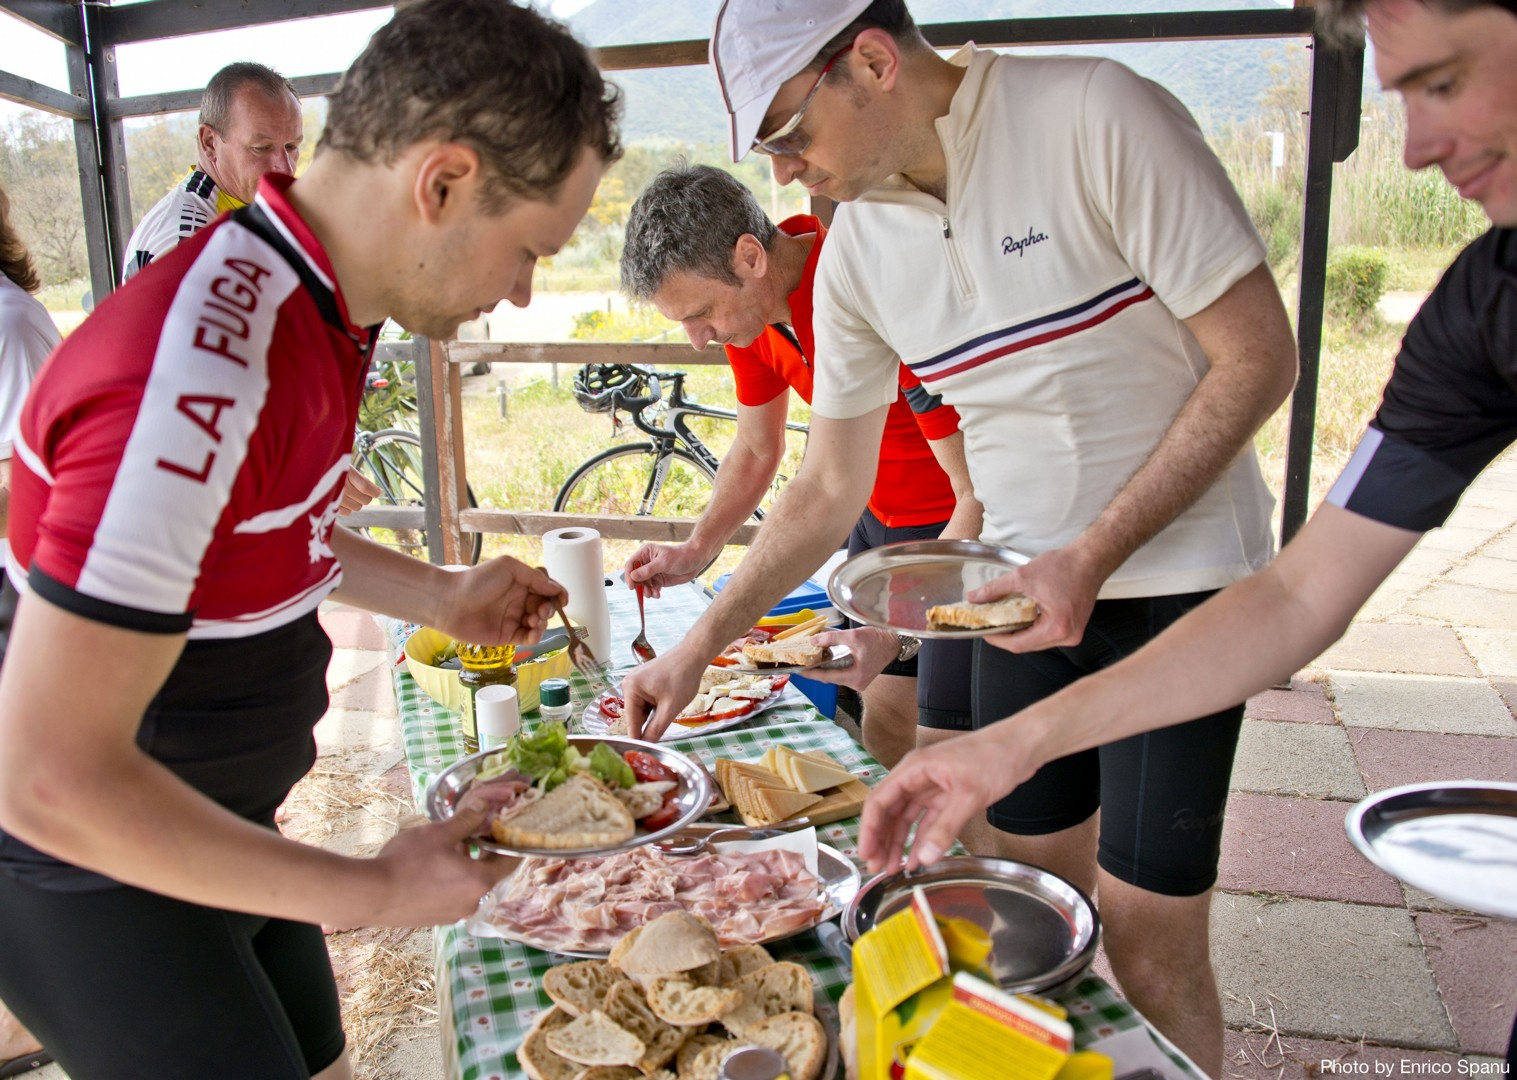 Guided-Road-Cycling-Holiday-Sardinia-Sardinian-Mountains-Flumendosa-Valley.jpg - Italy - Sardinia - Mountain Explorer - Guided Road Cycling Holiday - Italia Road Cycling